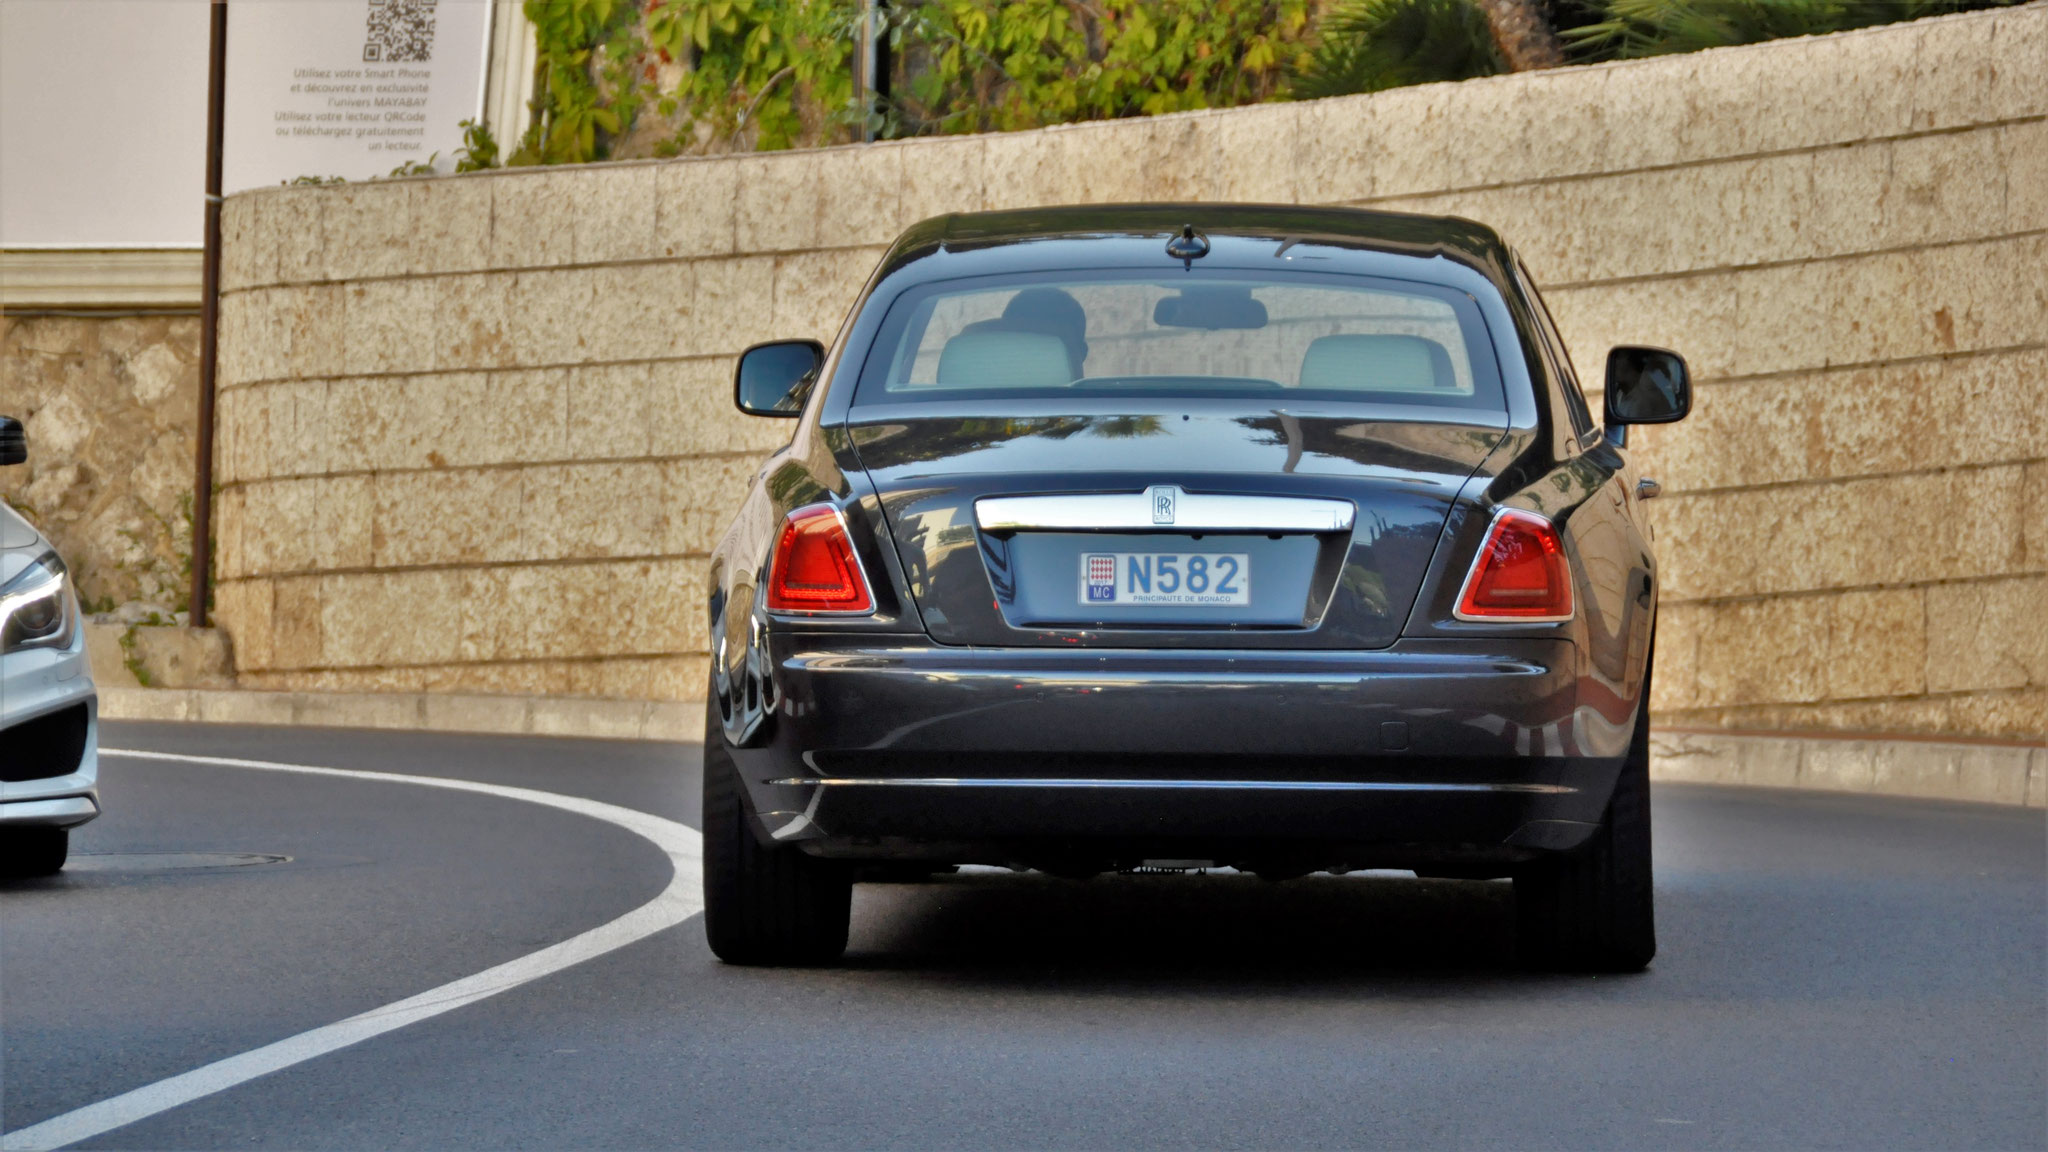 Rolls Royce Ghost - N582 (MC)